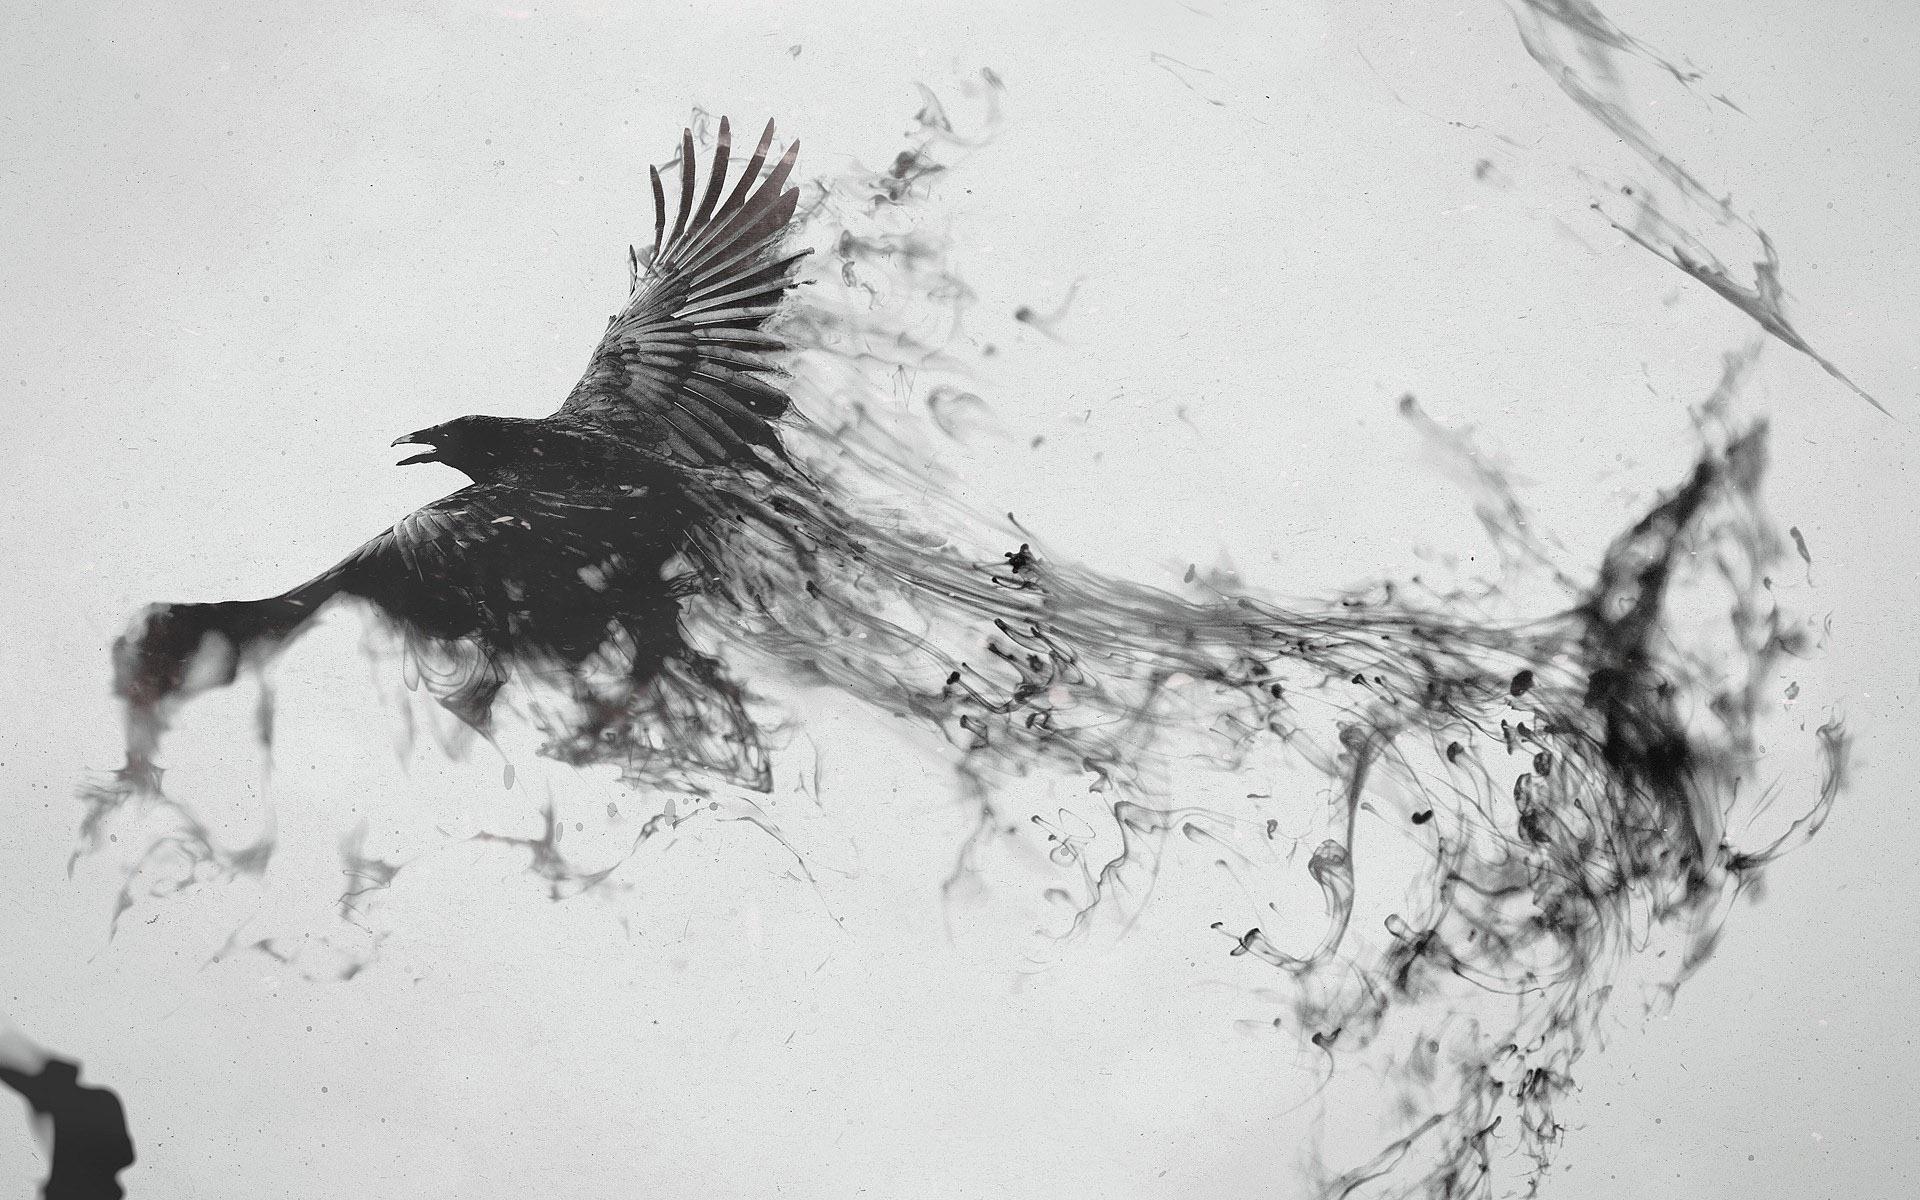 Wallpaper Black Raven Flying Bird Wings Smoke Creative Picture